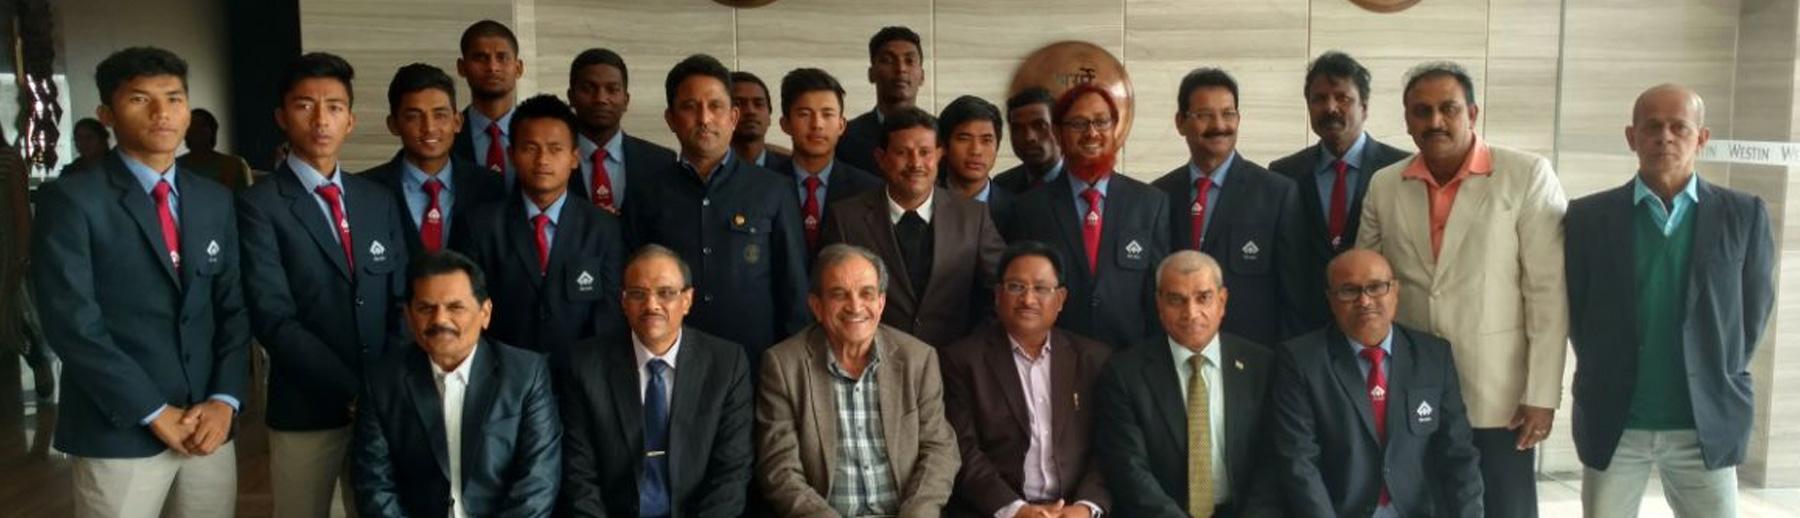 Shri Chaudhary Birender Singh felicitated the SAIL U-17 football team on winning the Subroto Cup Championship on 11th January 2018 in Kolkata.